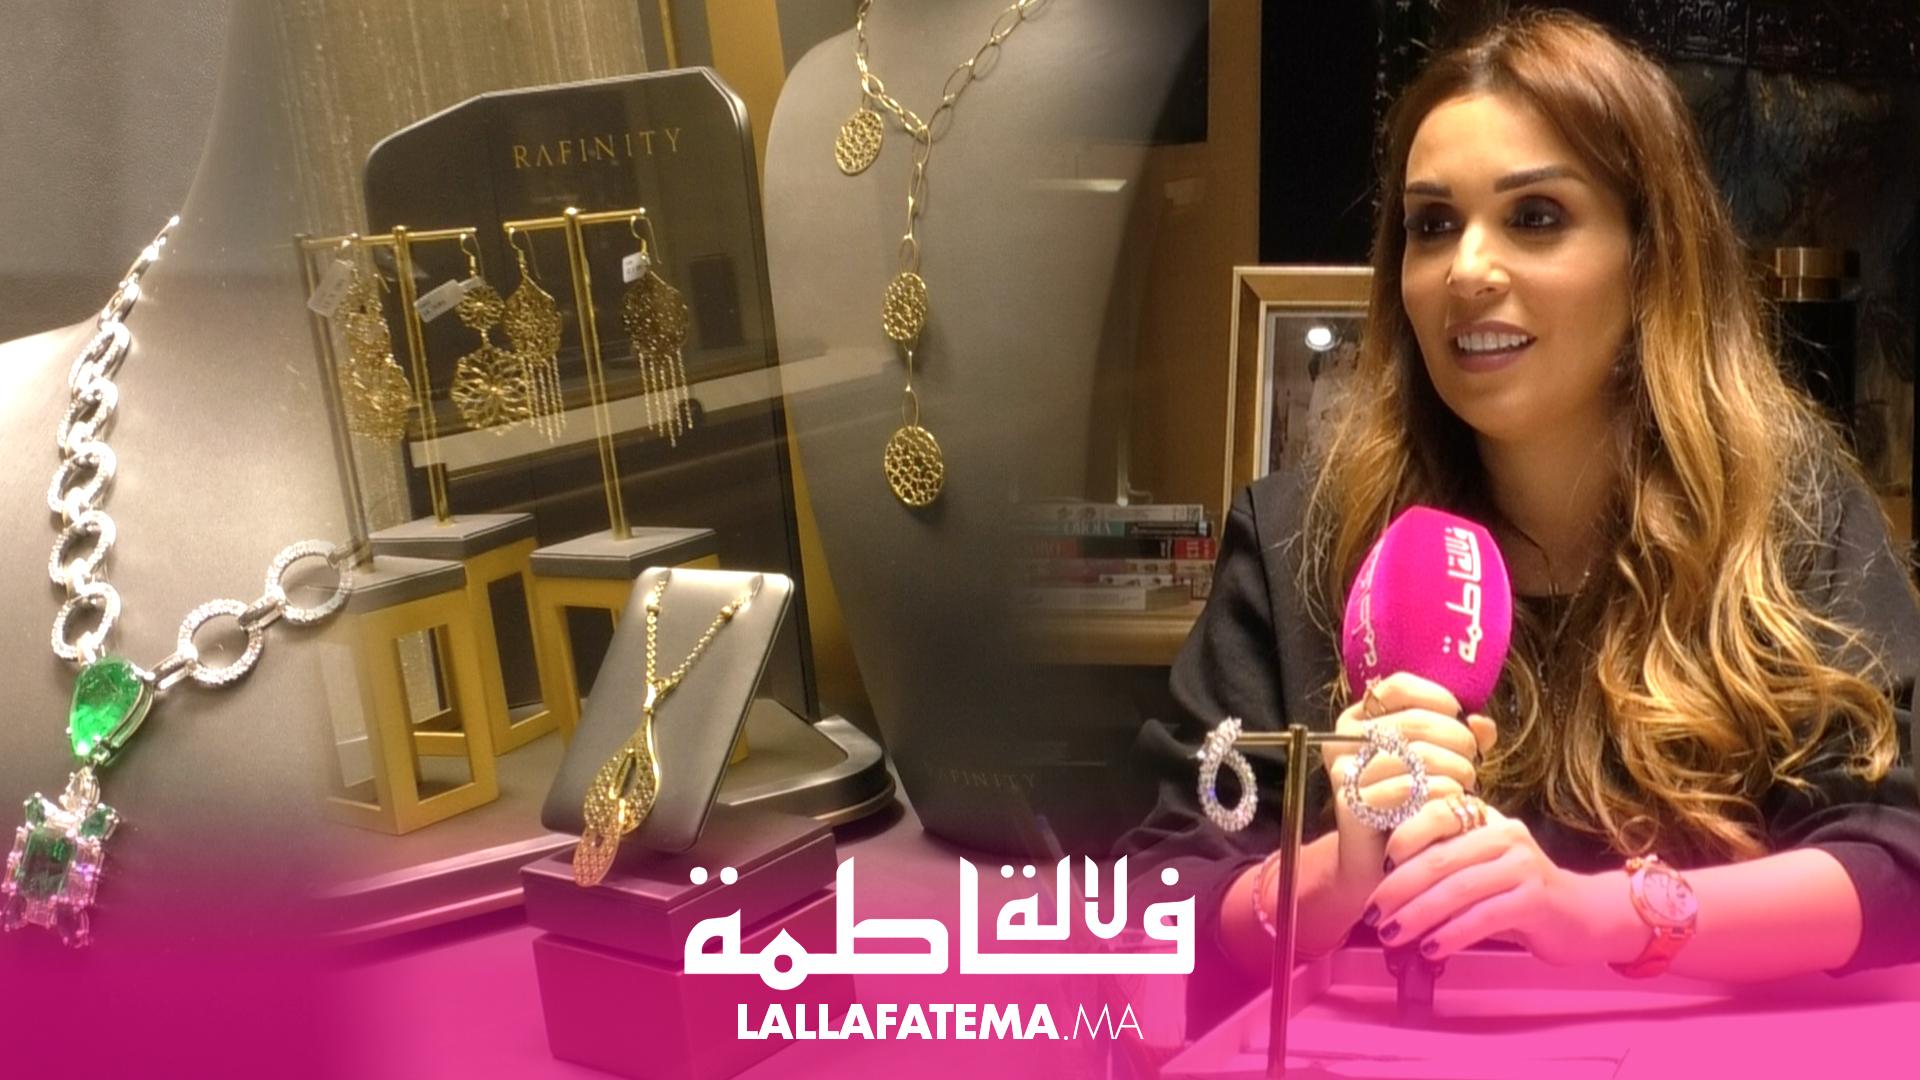 Rafinity تكشف عن مجمعها الجديد وتعرض آخر تصميمات مجوهراتها -فيديو-